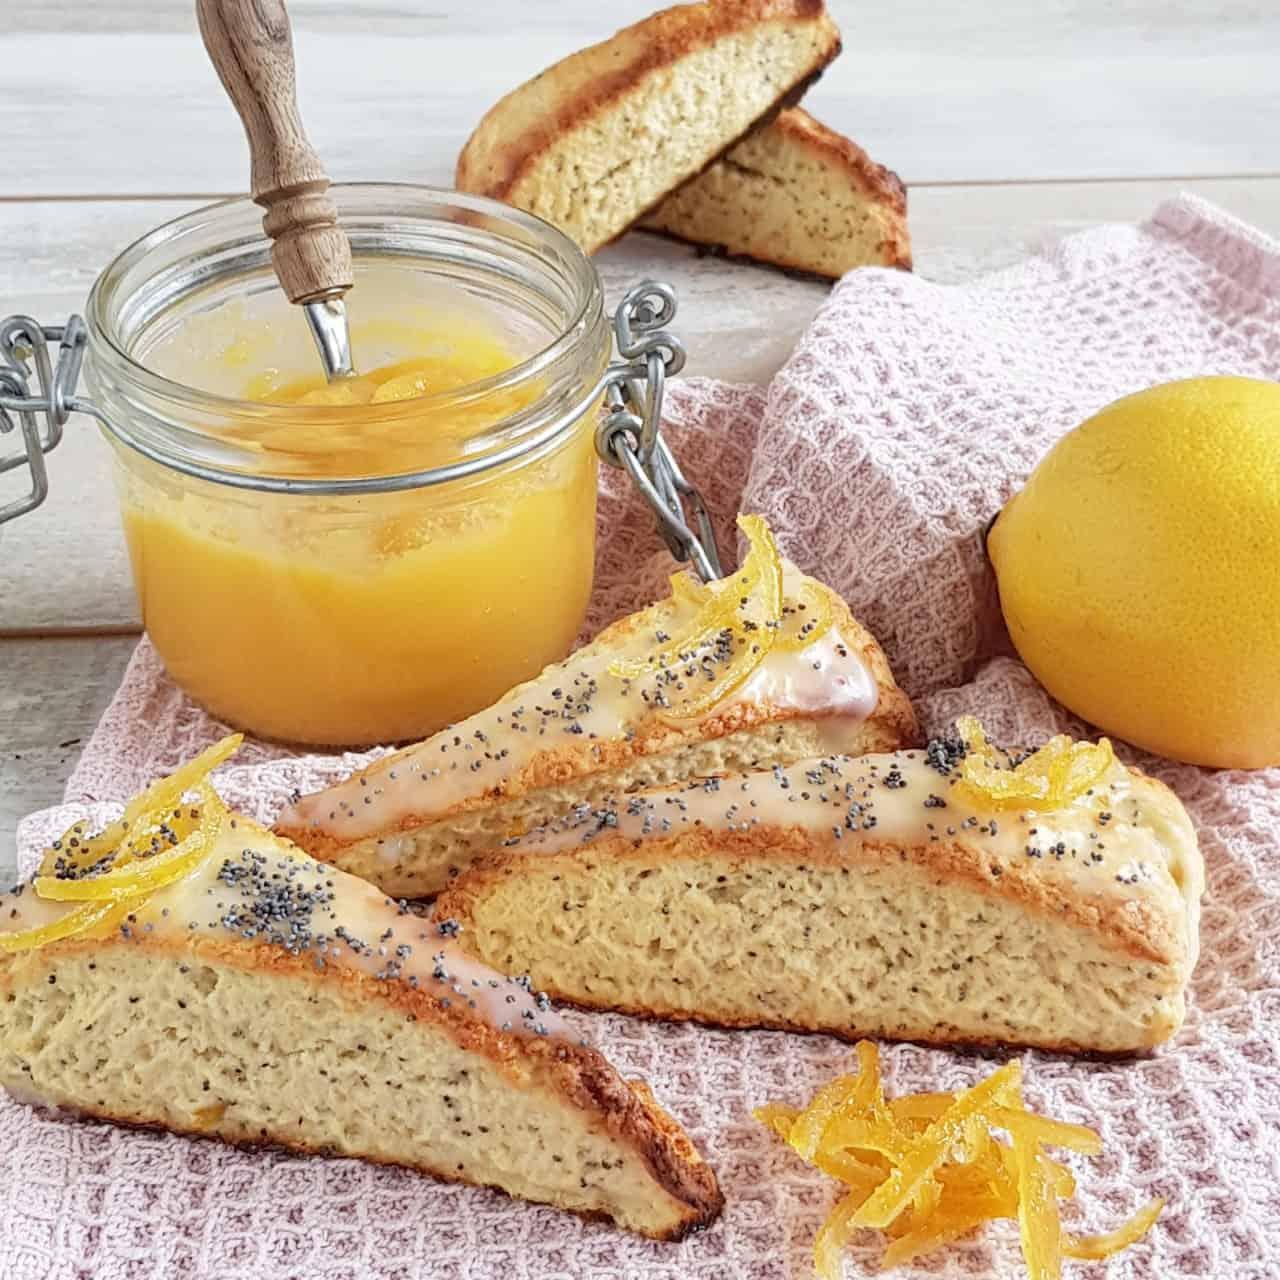 Citroen scones - Lemon poppyseed scones